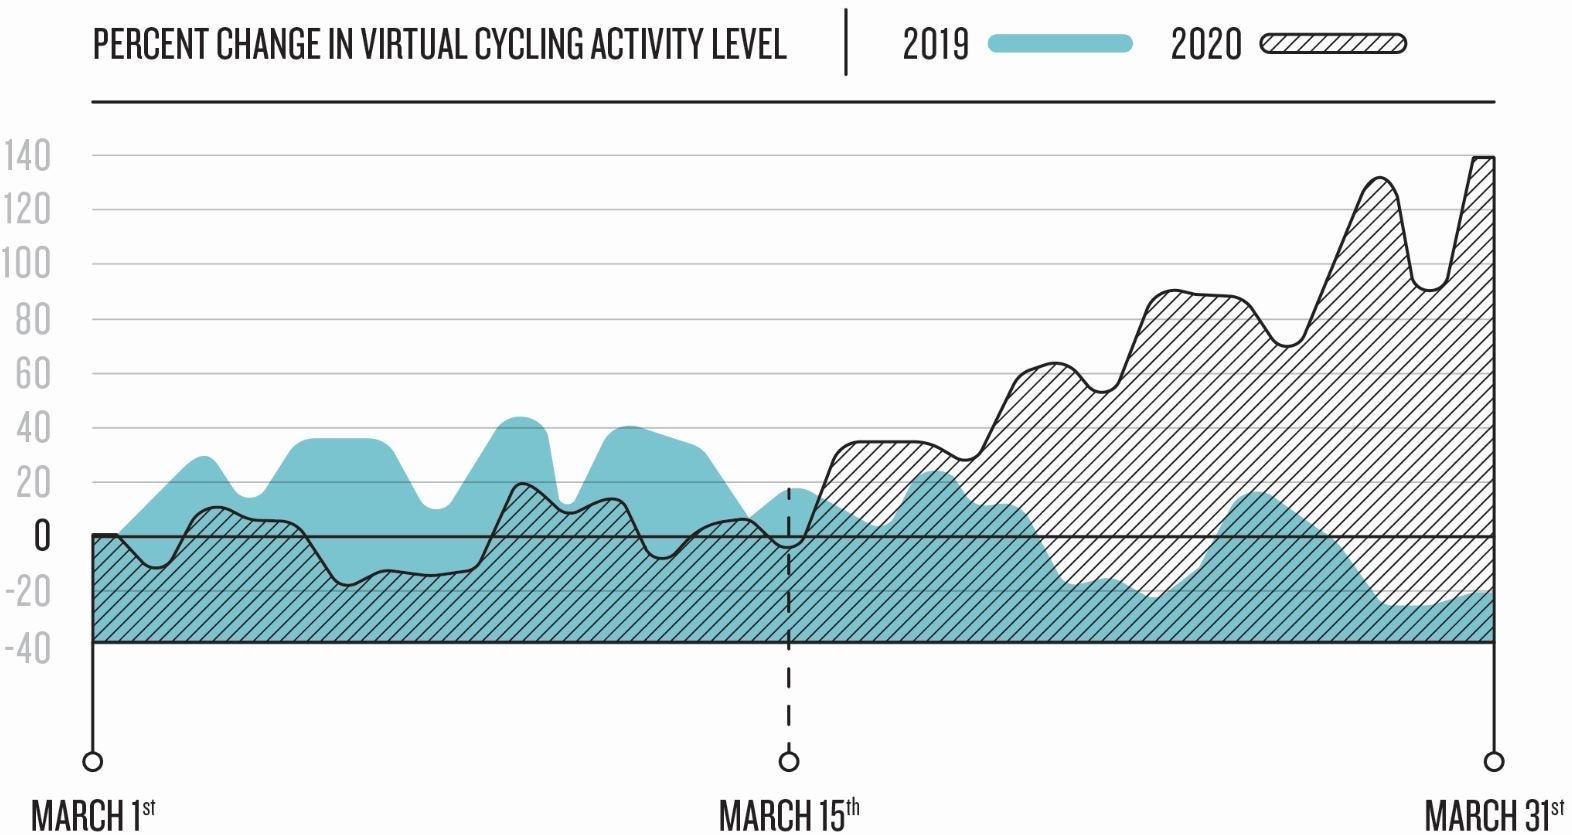 VirtualCycling